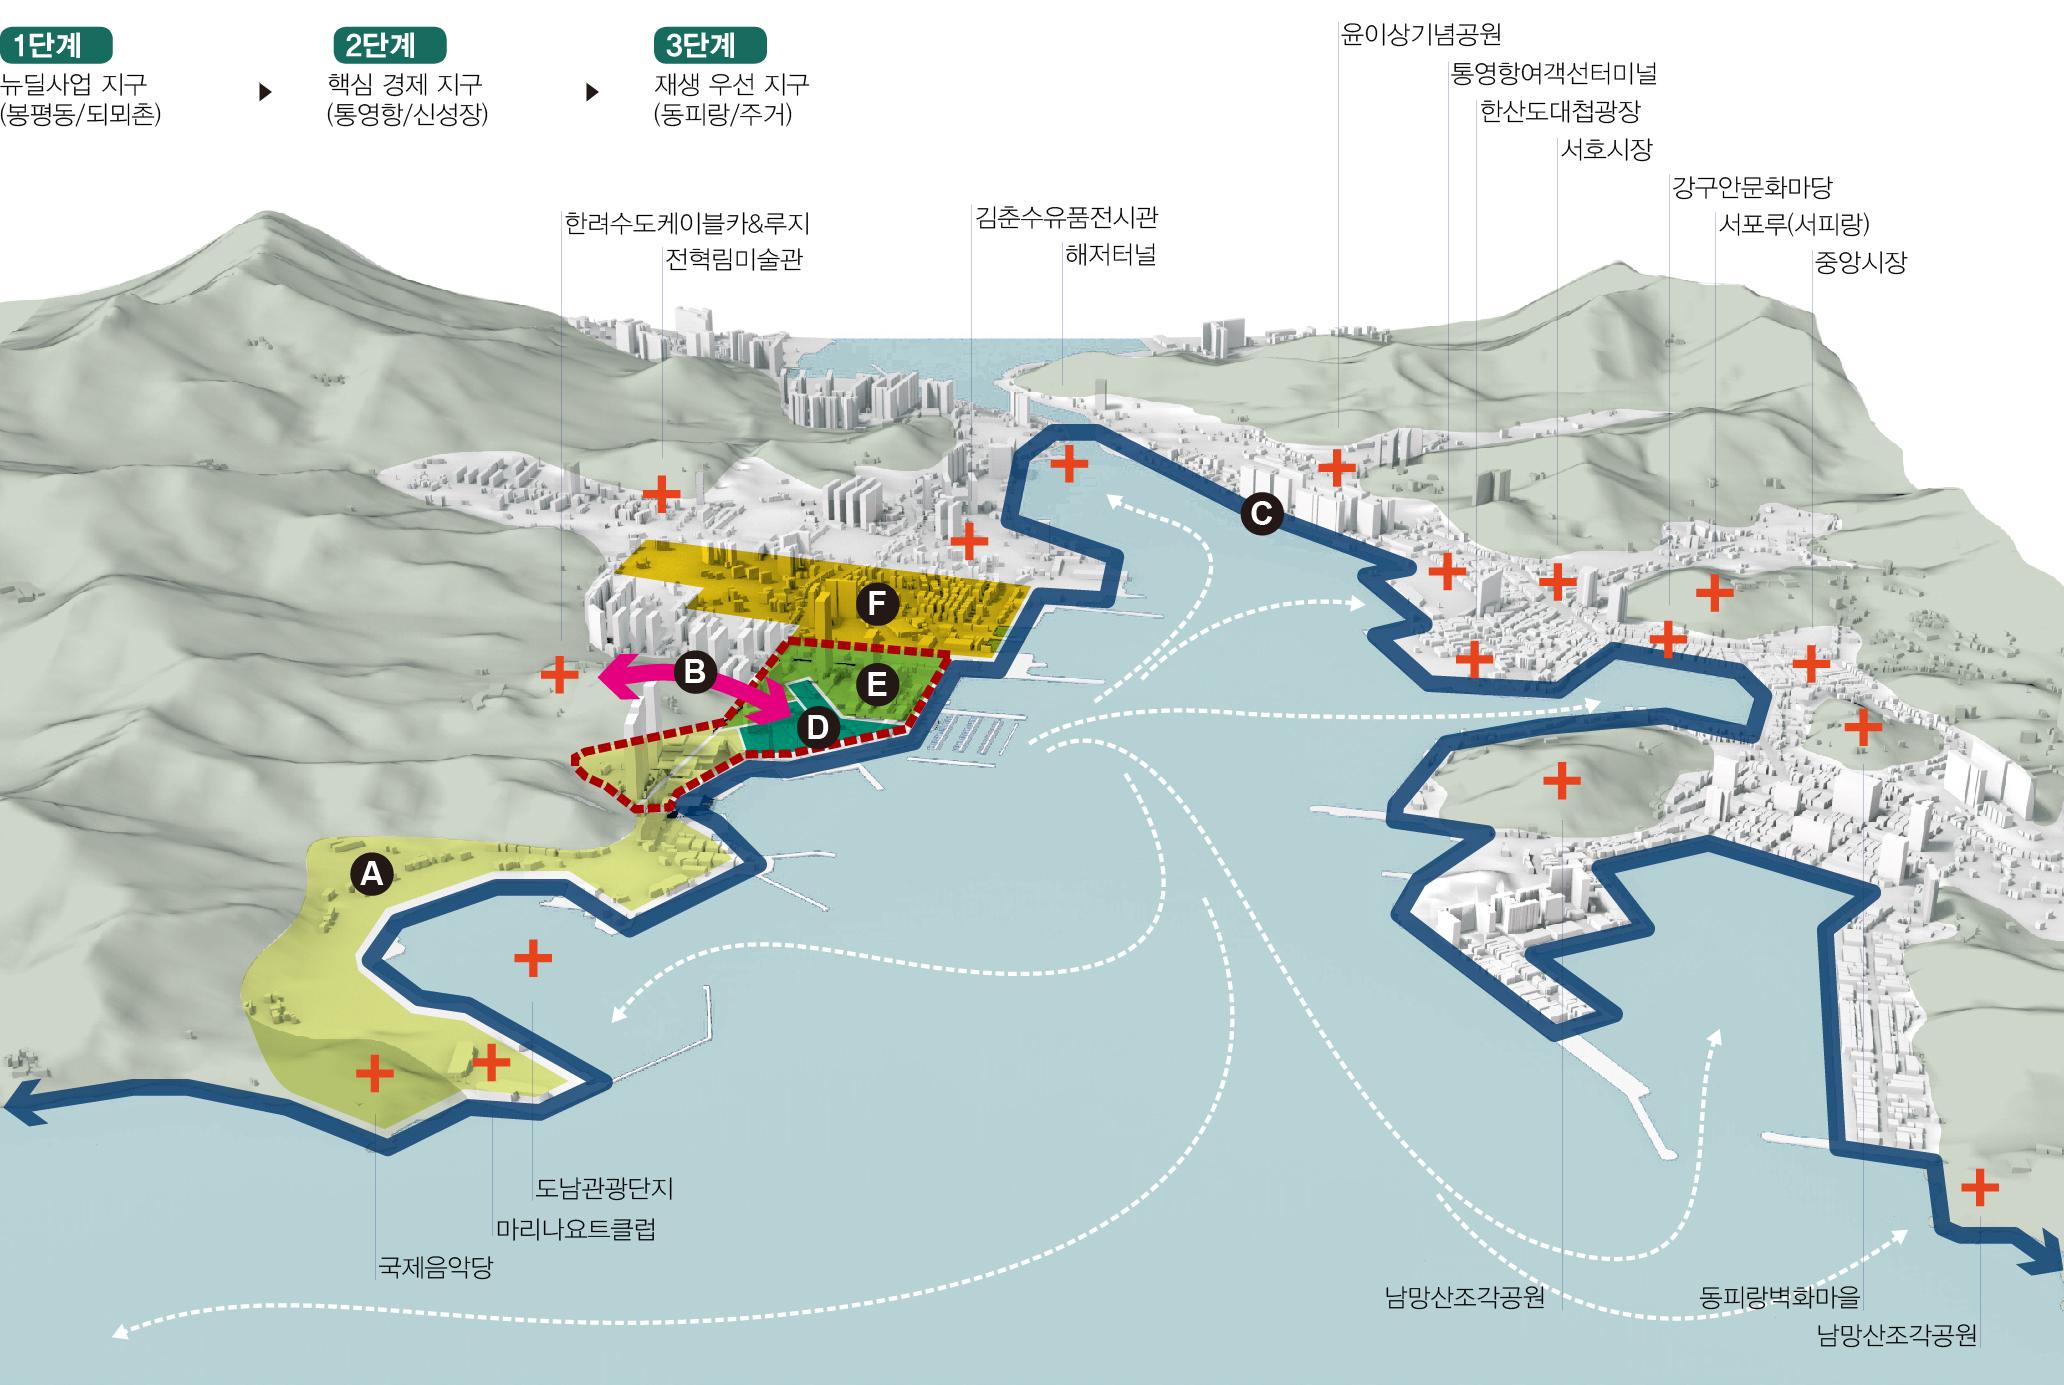 Regeneration of Tongyeong Dockyard